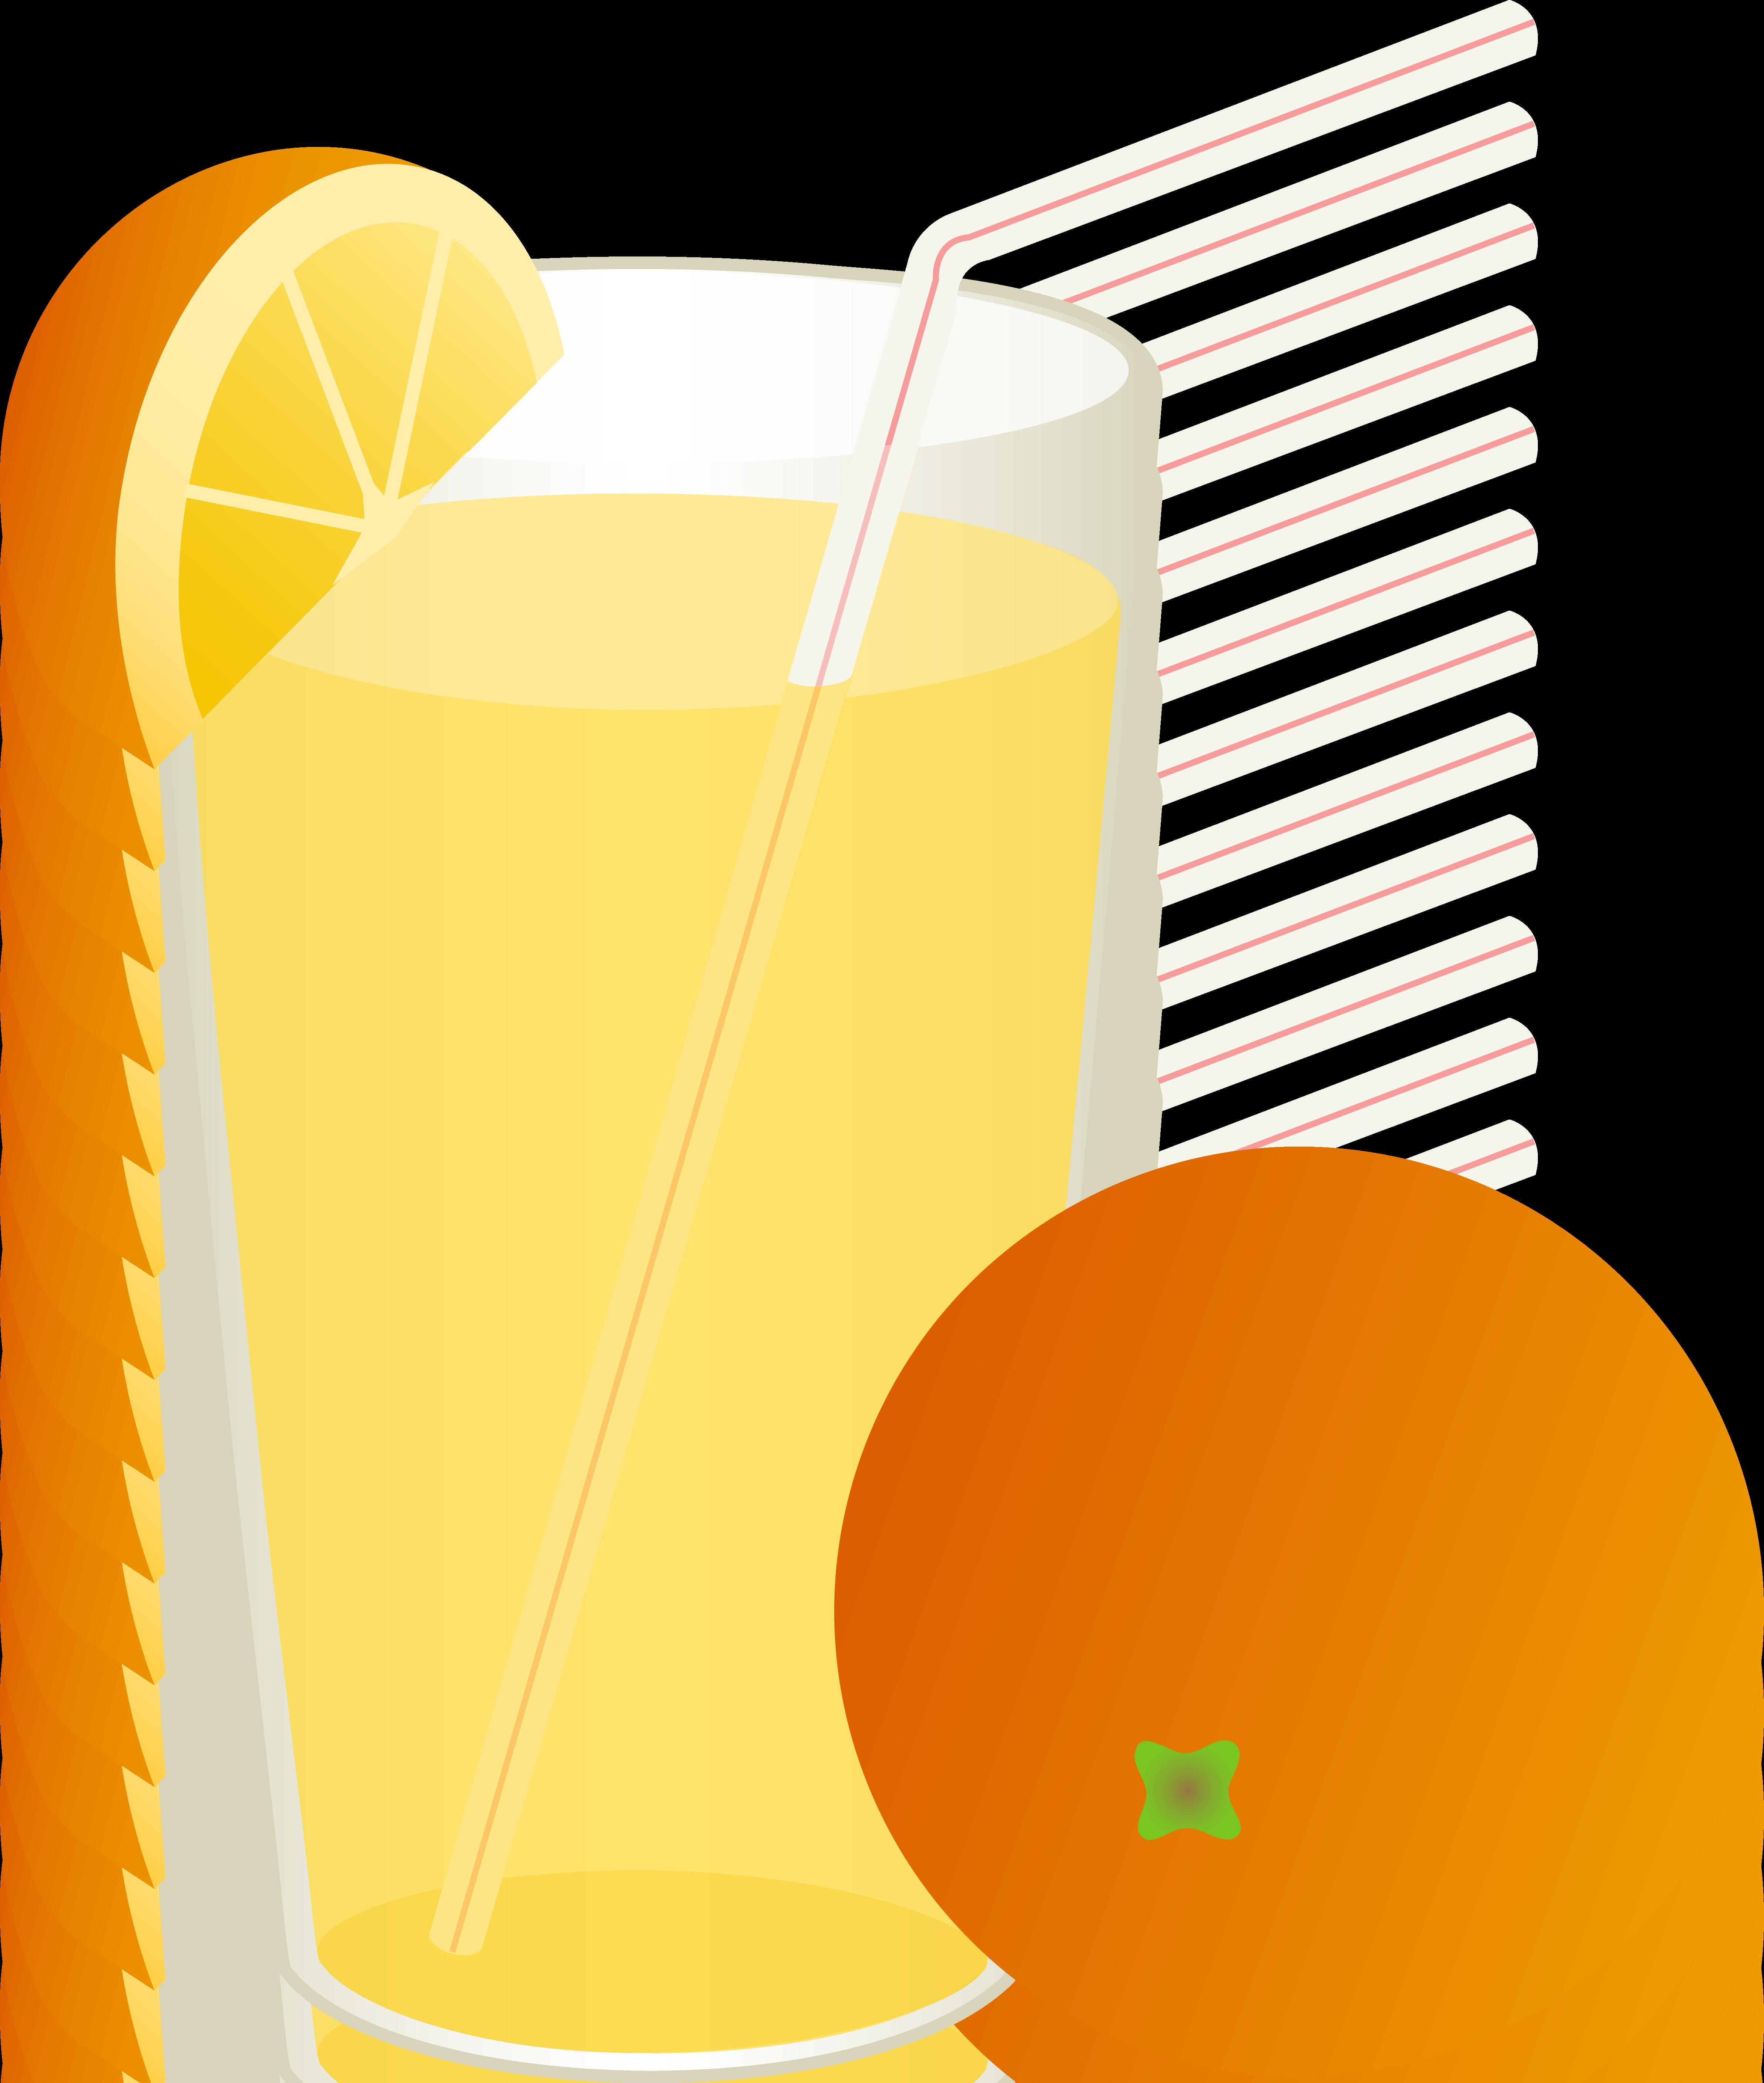 Drink clipart cup juice Glass Free Clipart Images orange%20juice%20clipart